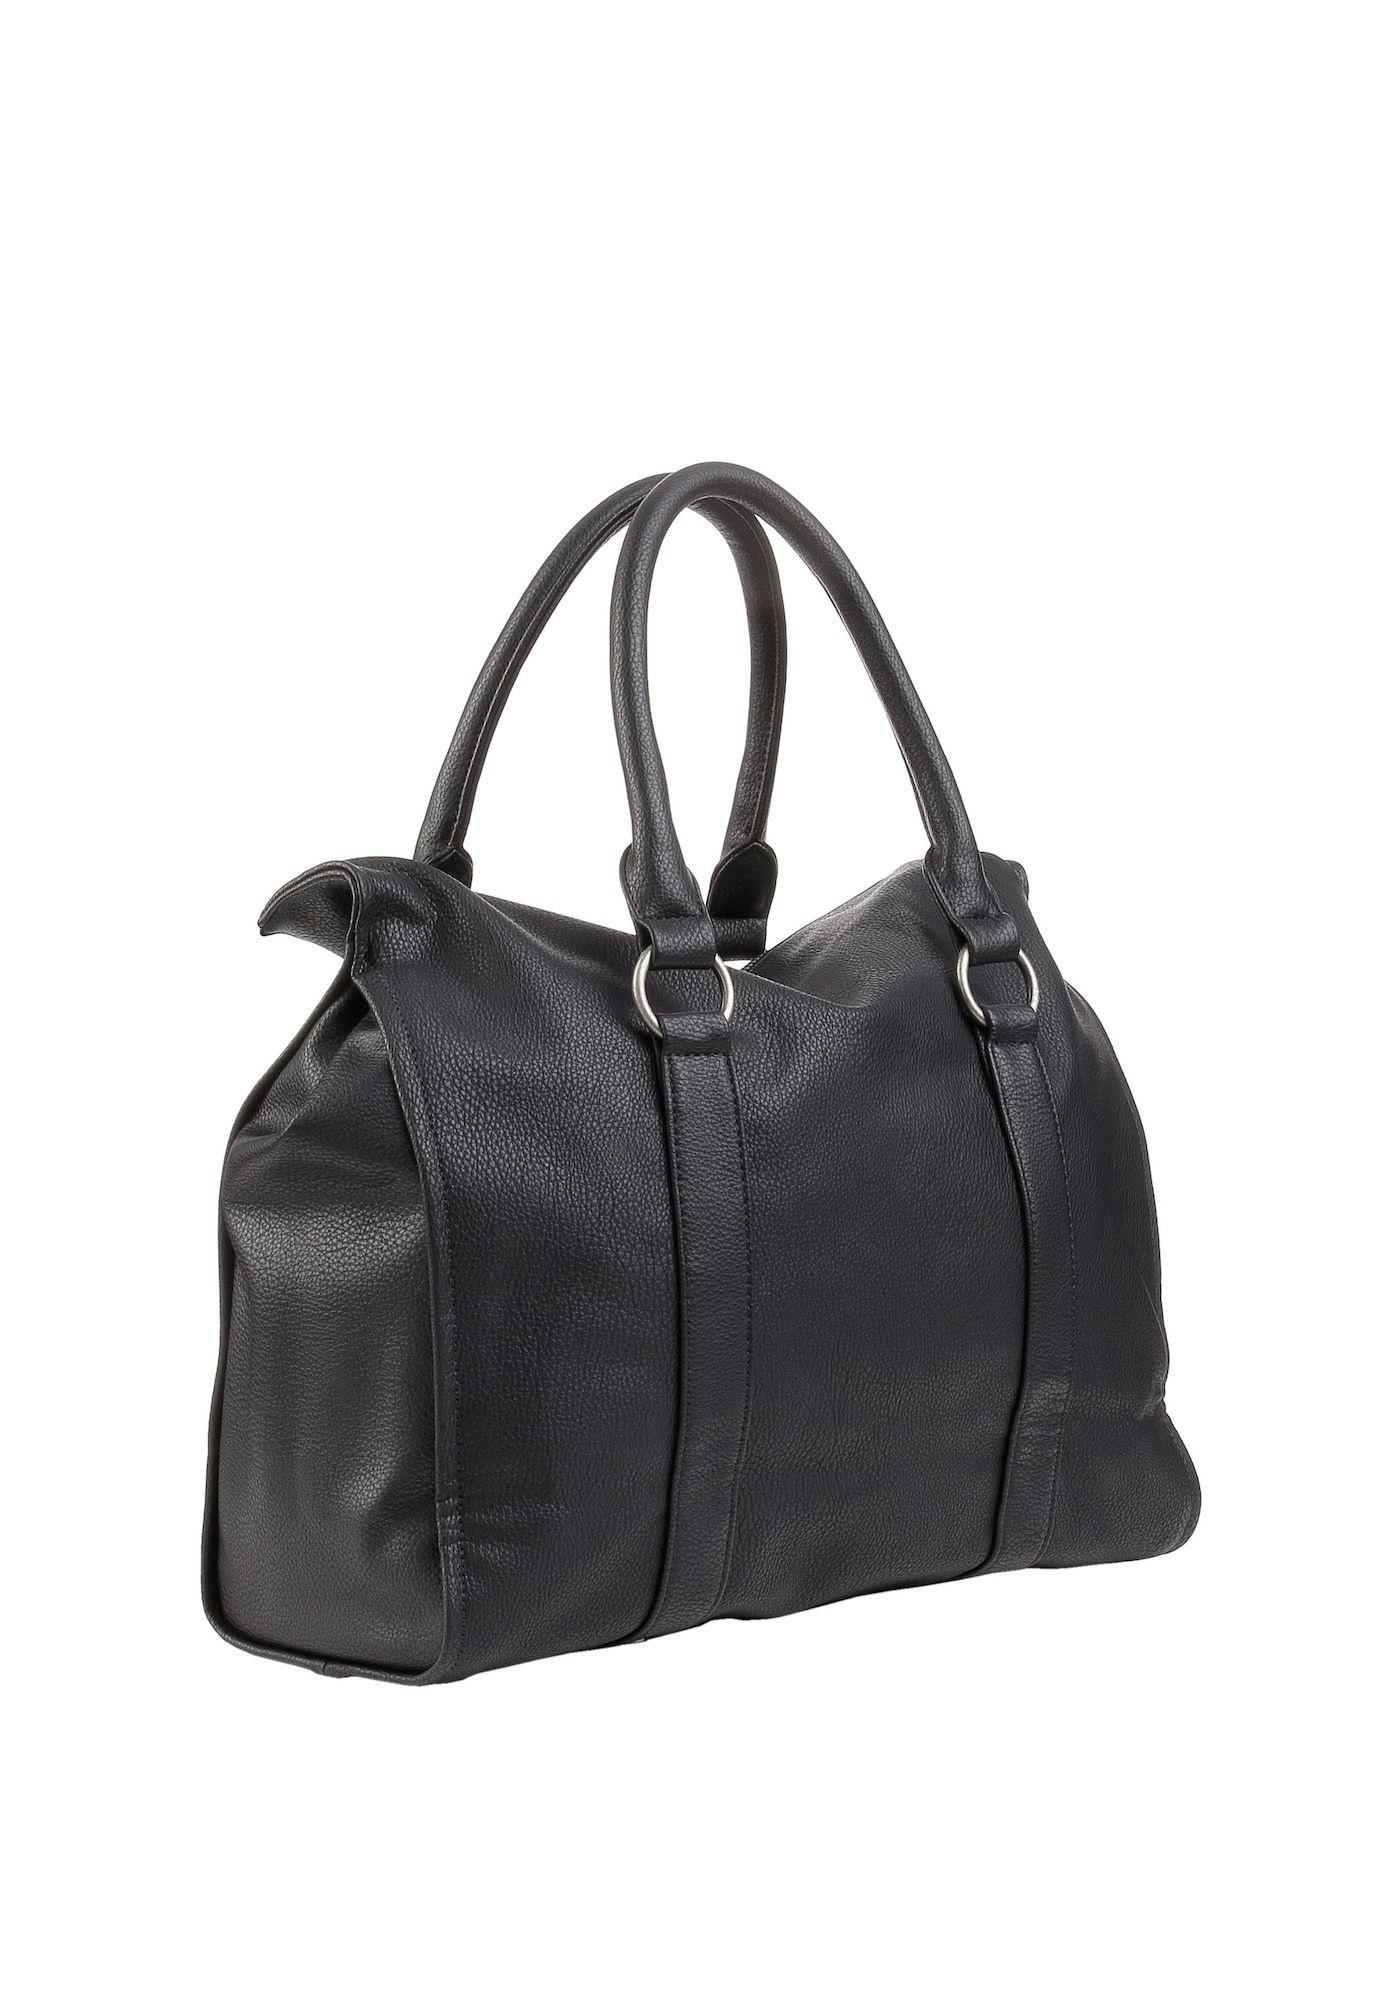 Fritzi Aus Preussen Shopper Cardiff Highland Damen Schwarz Grosse One Size Fritzi Aus Preussen Taschen Taschen Online